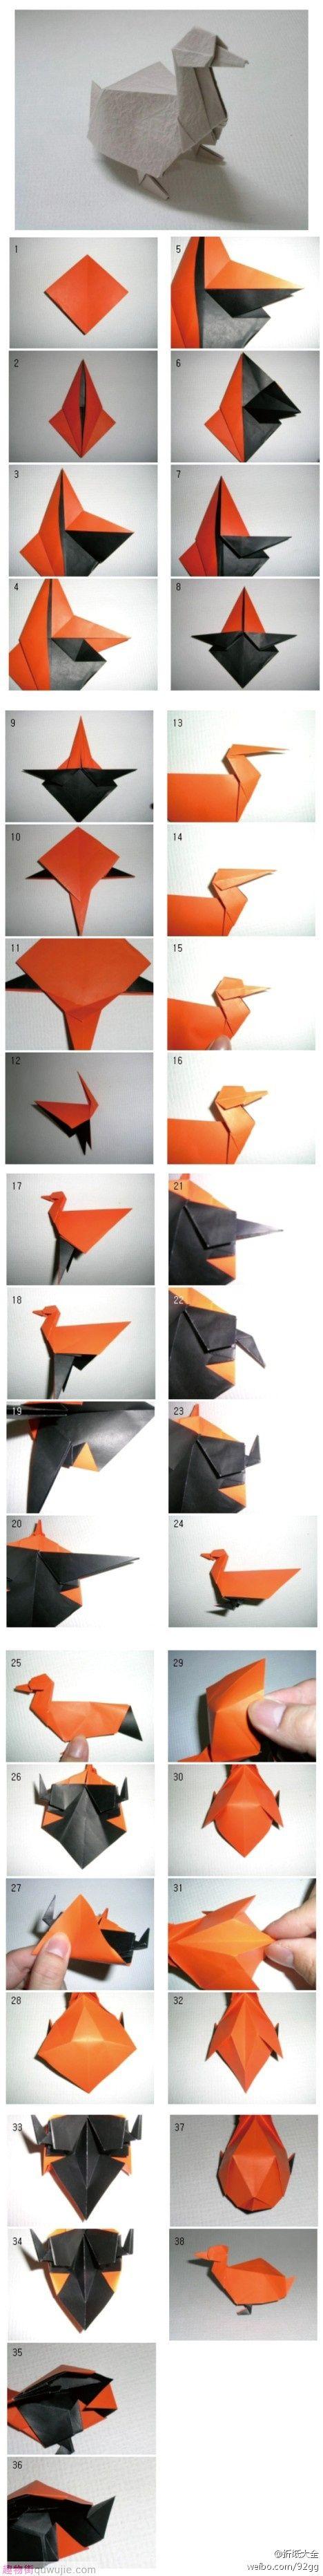 Duck Origami.